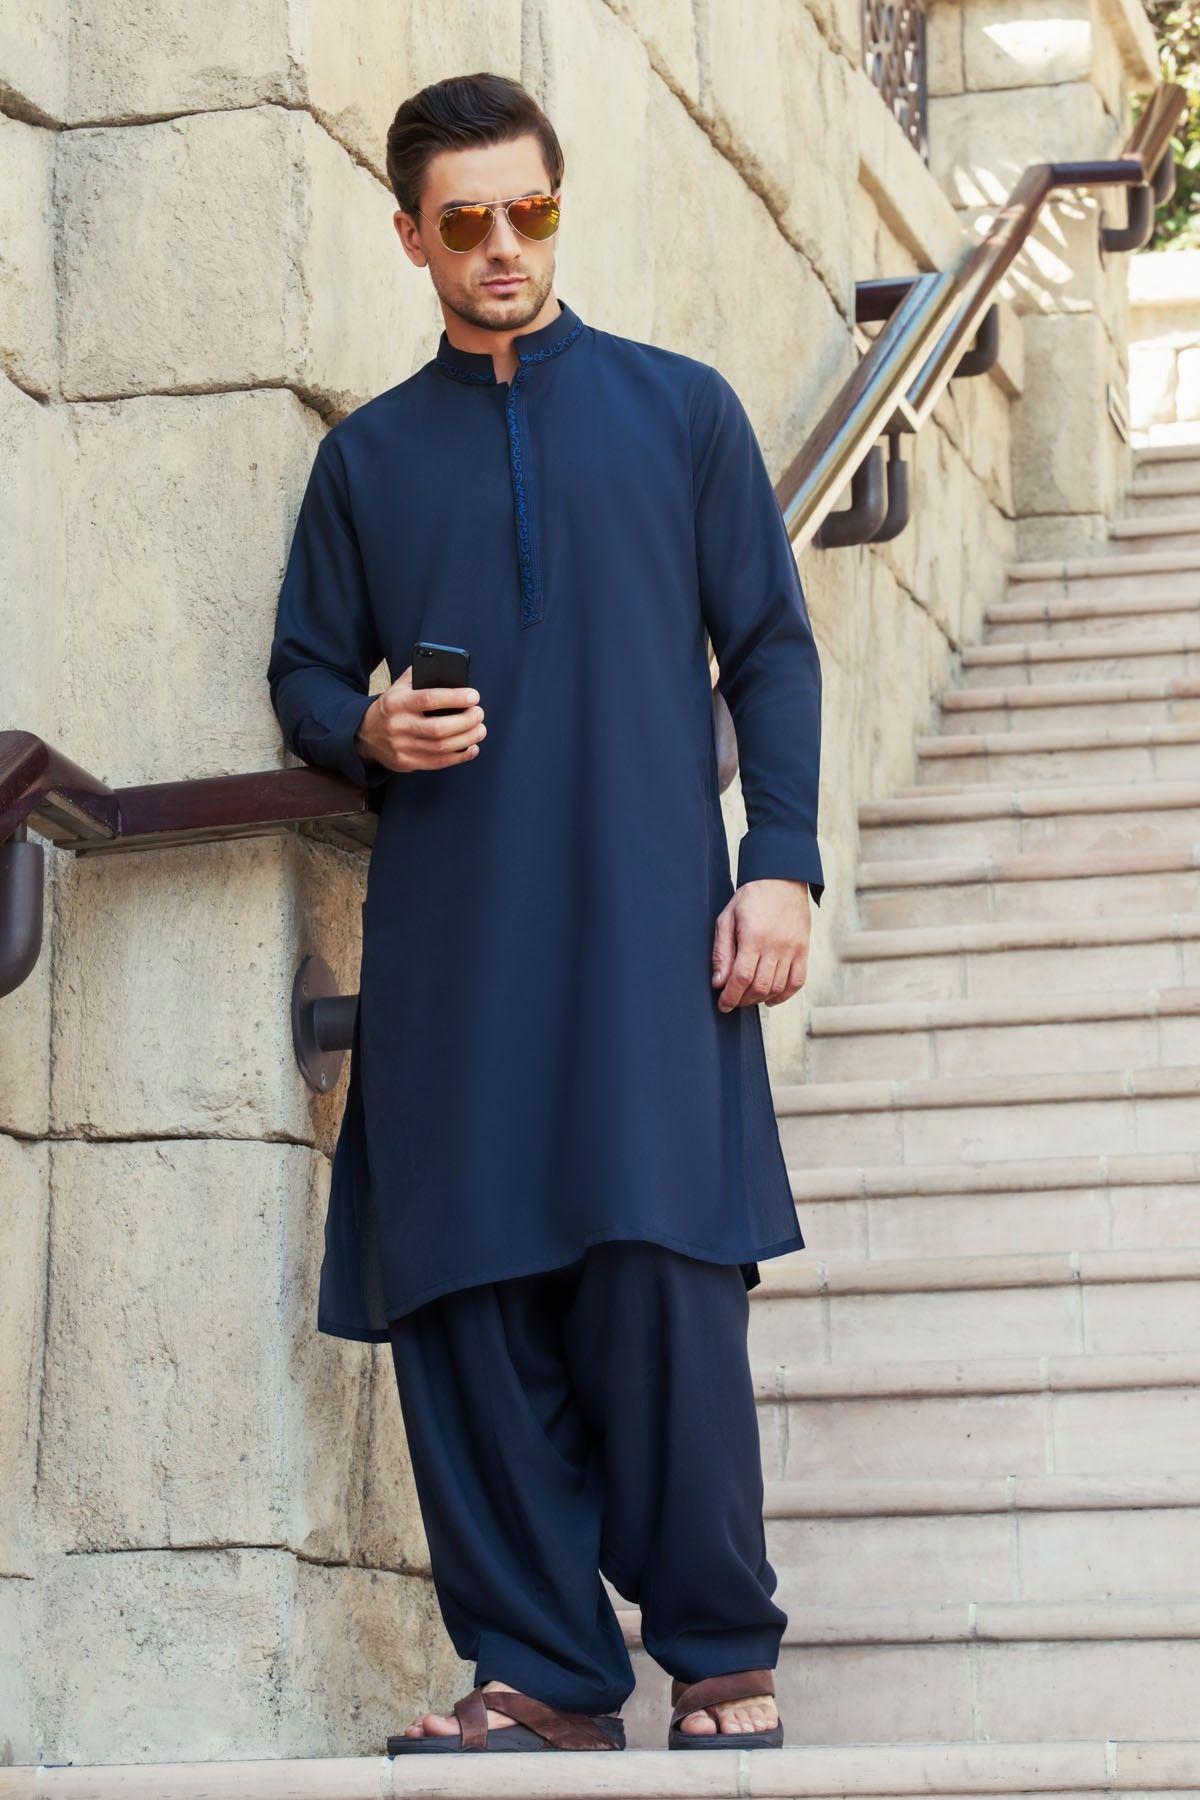 Eid kids kurta shalwar kameez designs 2013 2014 - Bonanza Men Kurta Shalwar Kameez Eid 2016 2017 Collection